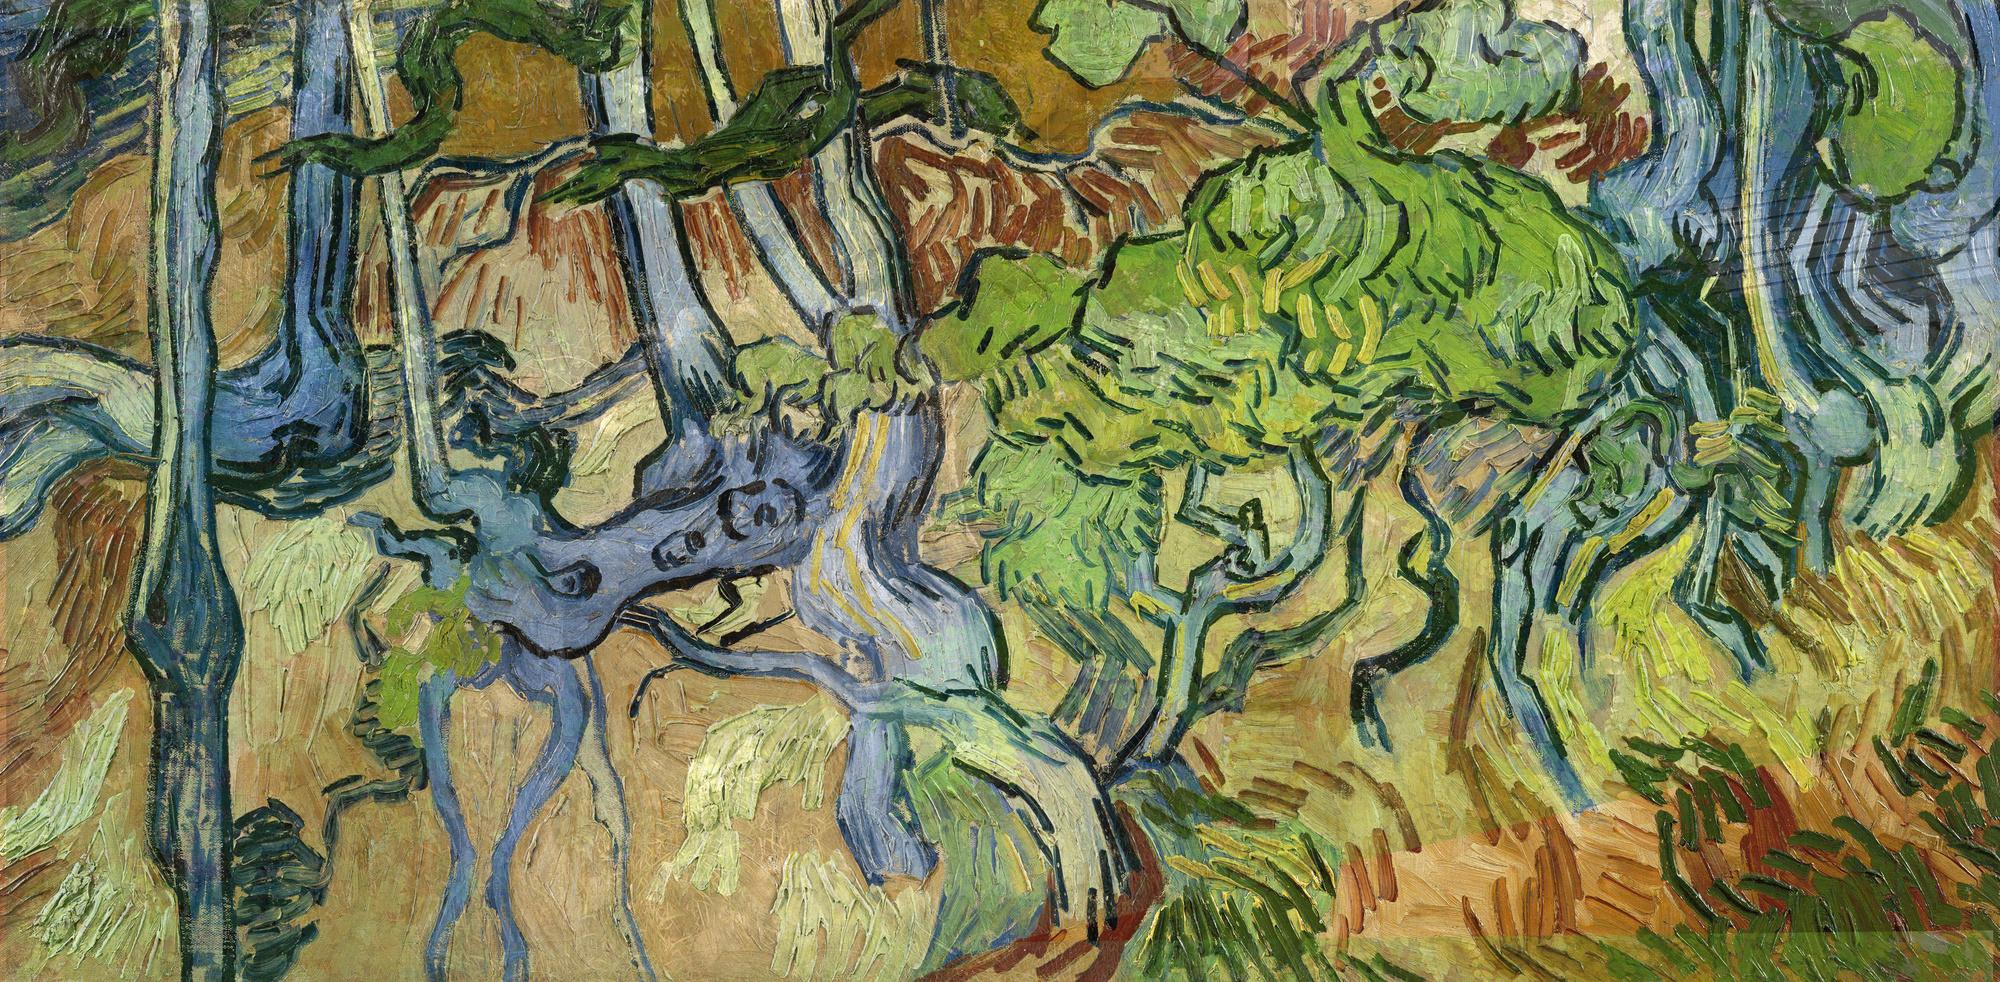 Vincent Van Gogh, Les , 27 juli 1890., Collectie Van Gogh Museum, Amsterdam @ Arthénon